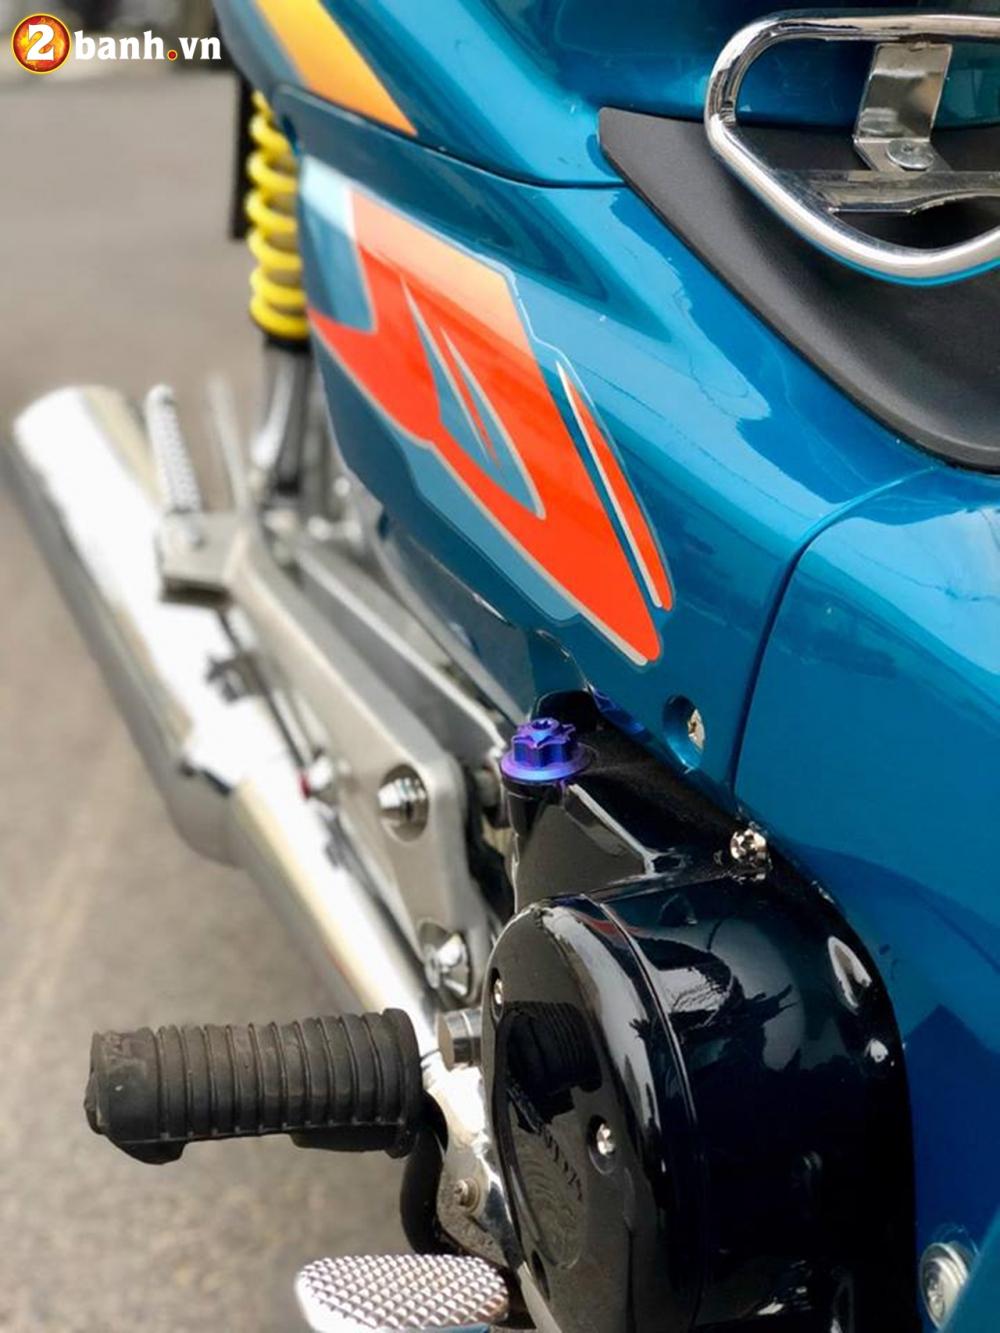 Honda Wave su hoi sinh bat diet trong moi thoi dai cua lang xe Viet - 11